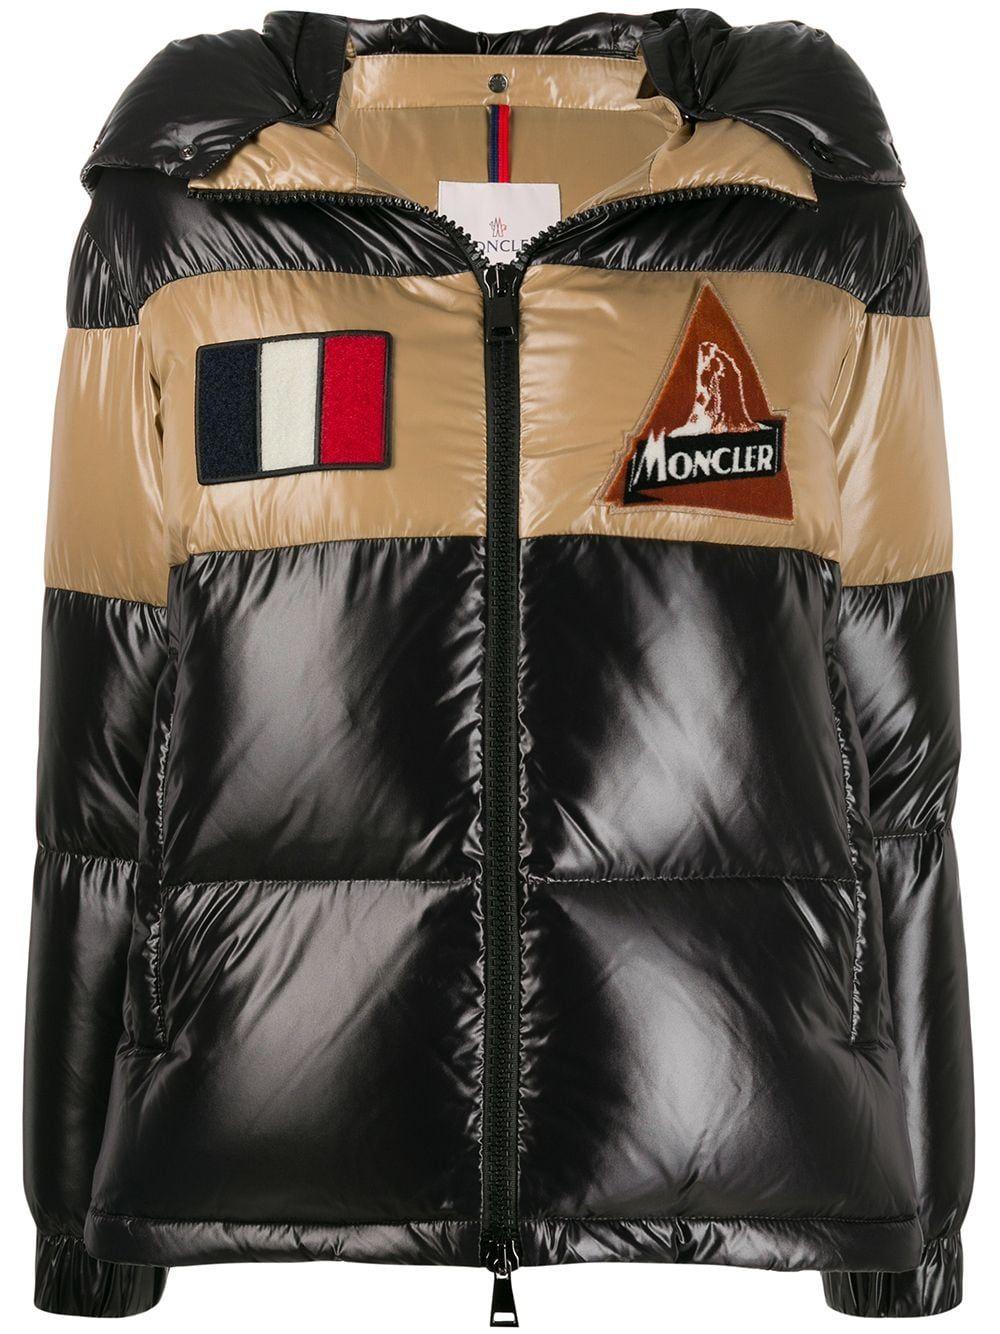 Moncler Patch Details Puffer Jacket Farfetch Moncler Puffer Jackets Jackets [ 1334 x 1000 Pixel ]